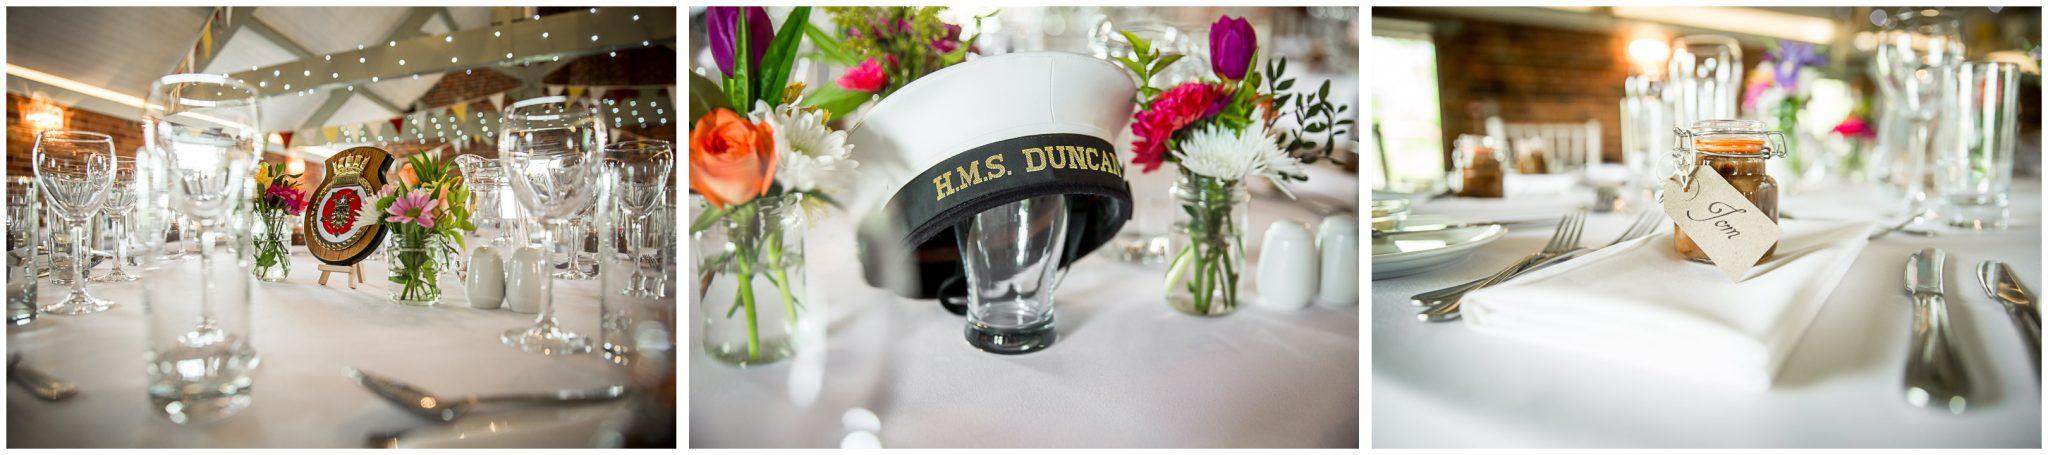 Sopley wedding photographer wedding breakfast table details